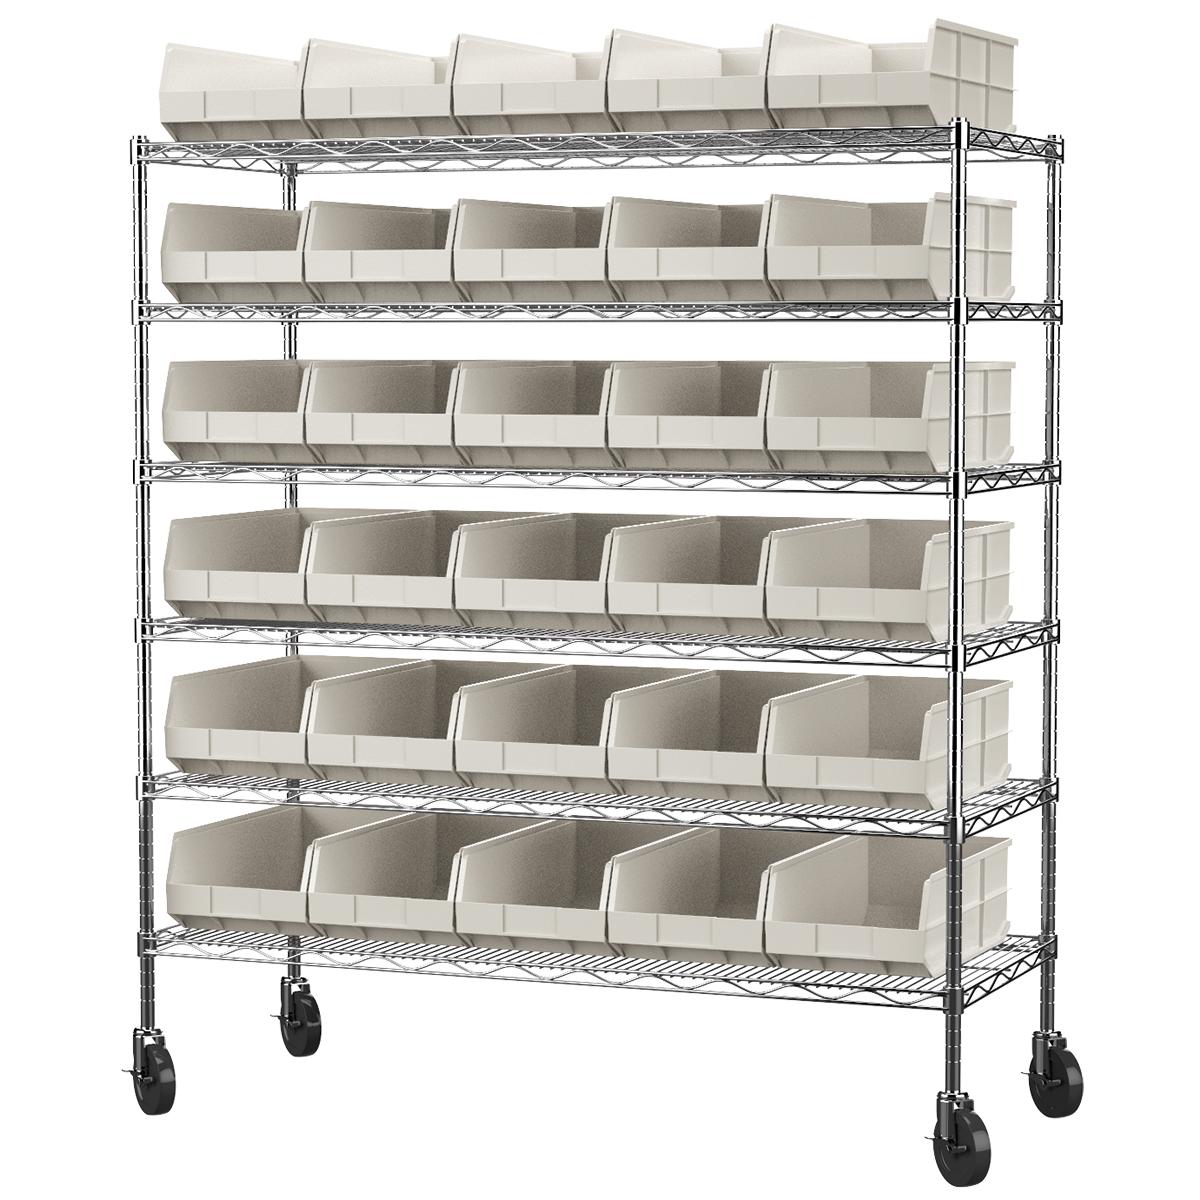 Akro-mils | Stackable Plastic Storage Bins | Storage Cabinets ...